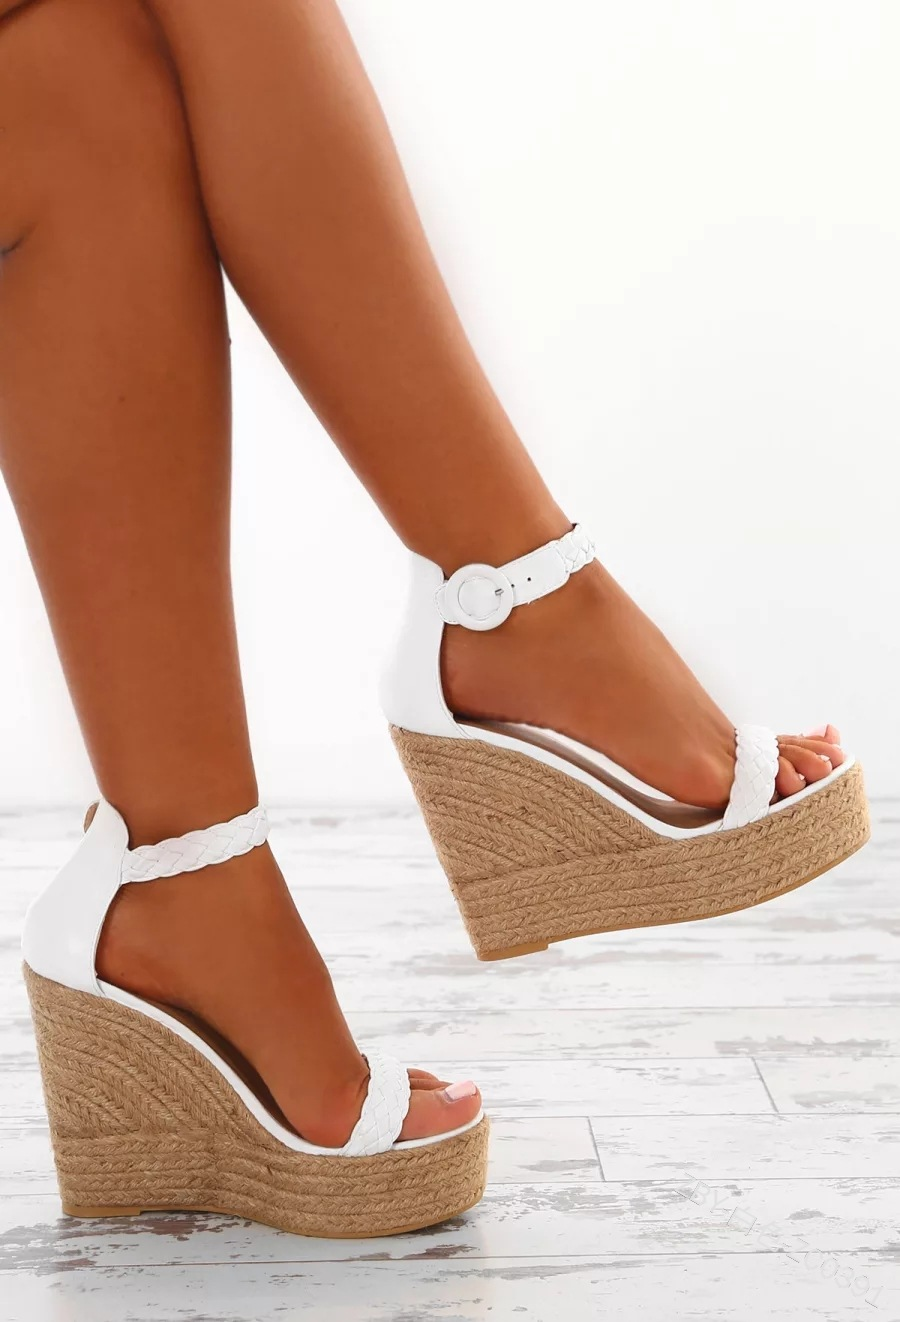 Wedges Shoes Platform Women Sandals Open-Toe Summer Heel-Buckle Solid Mature Dress